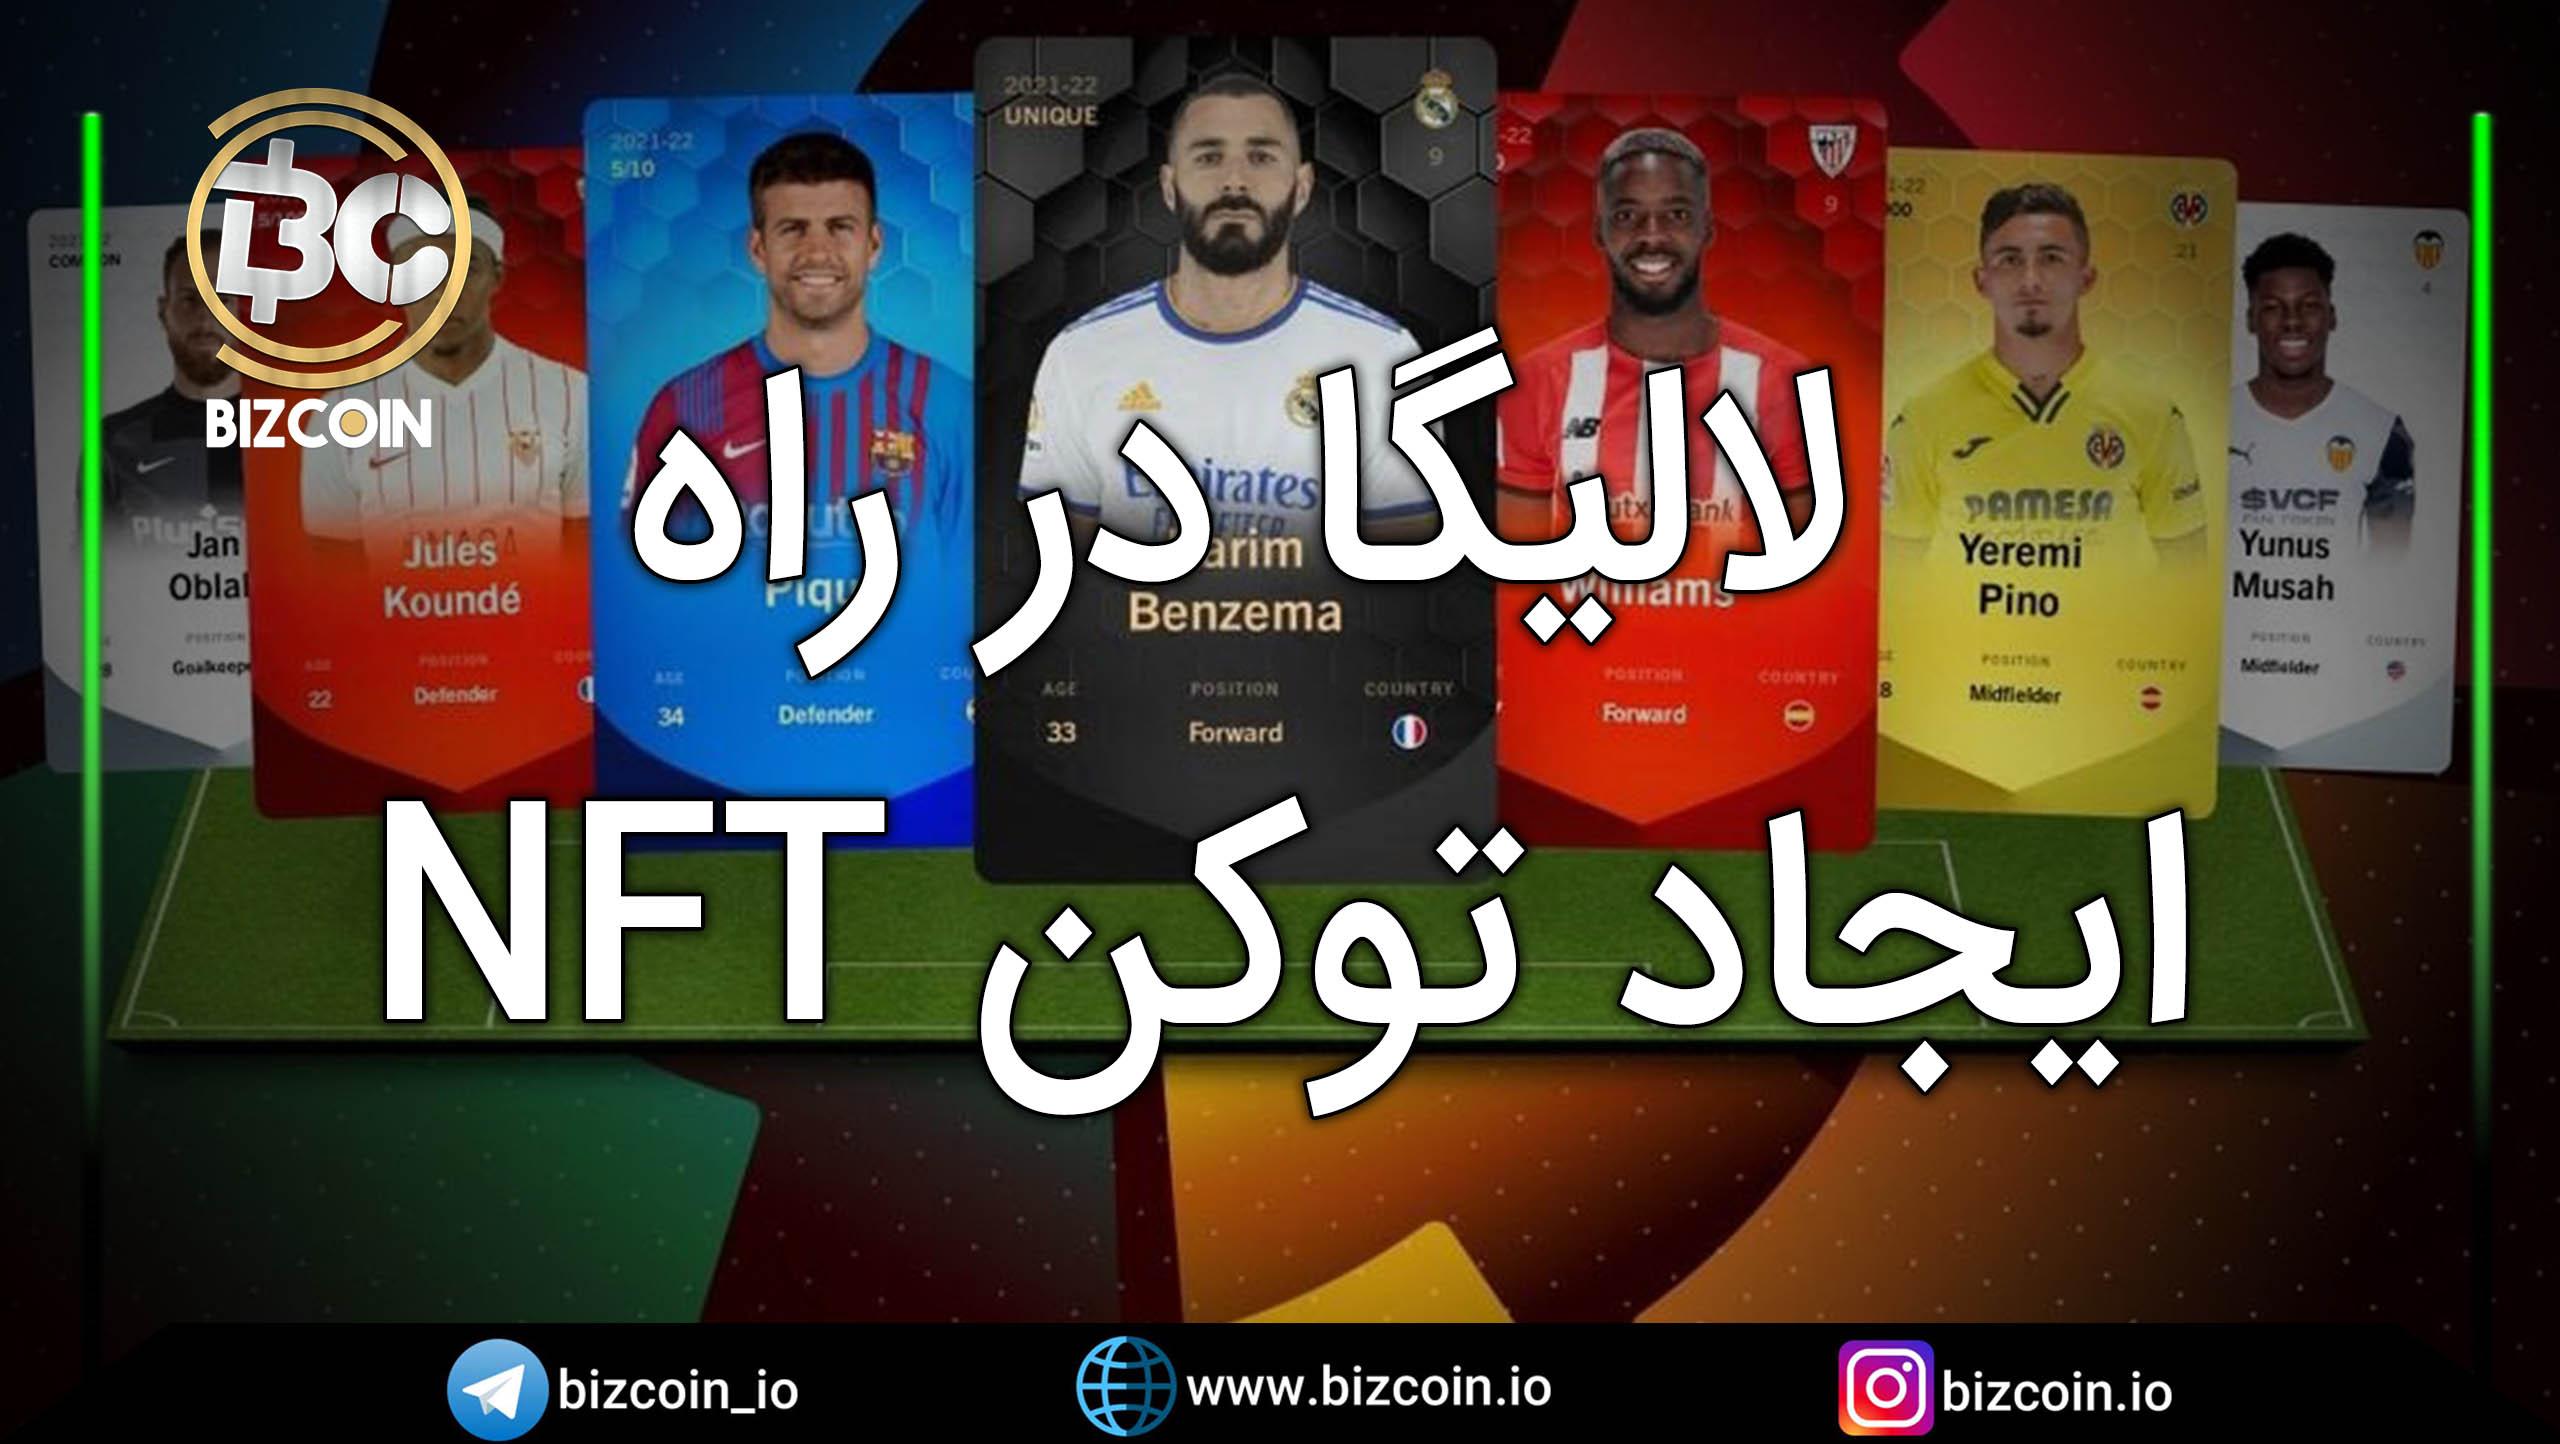 La Liga on the way to creating NFT tokens لالیگا در راه ایجاد توکن NFT